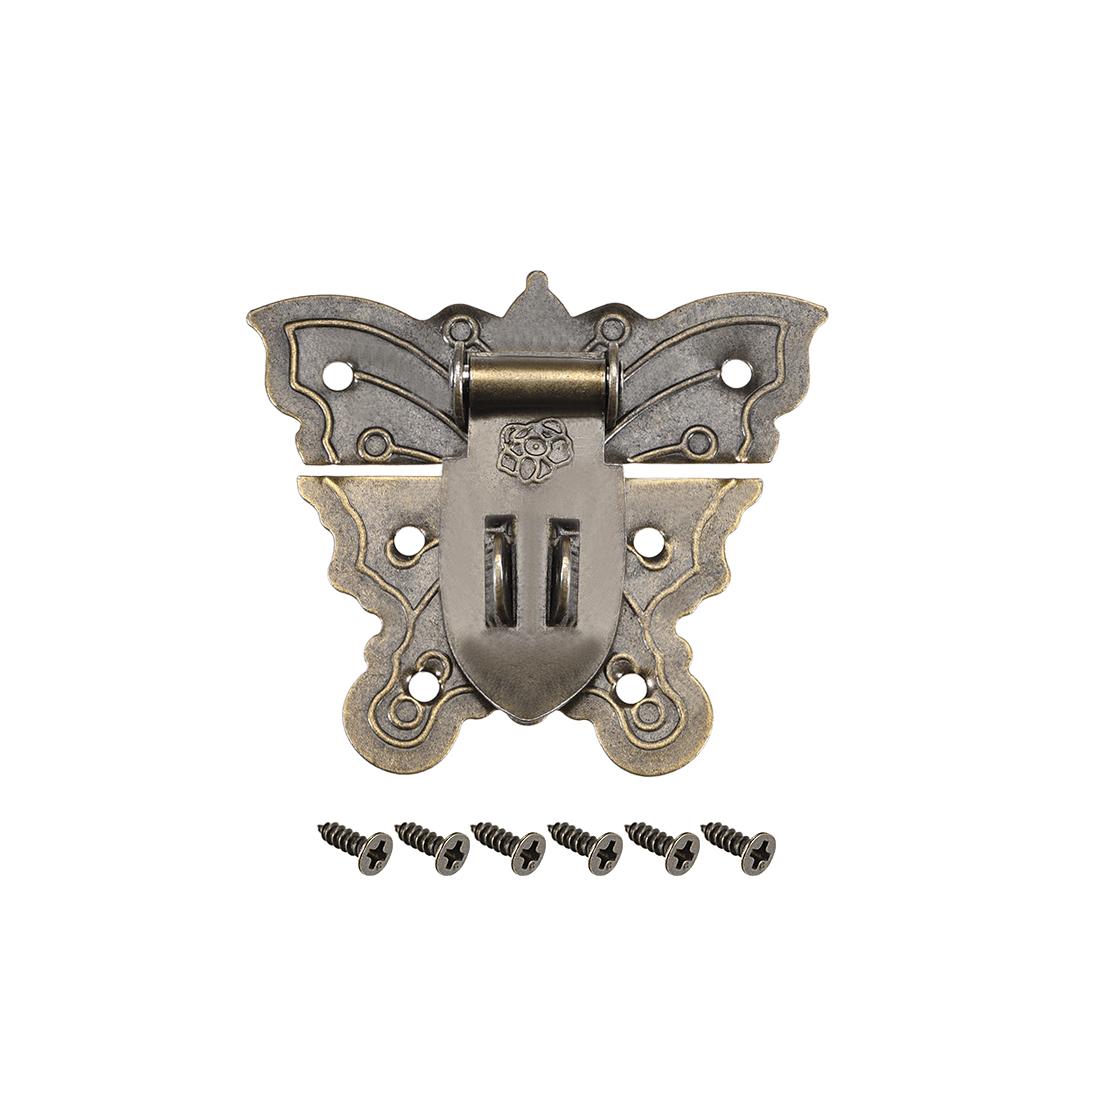 Wood Case Box Butterfly Hasp 60x51mm Antique Latches Hook Bronze Tone, 5 Pcs